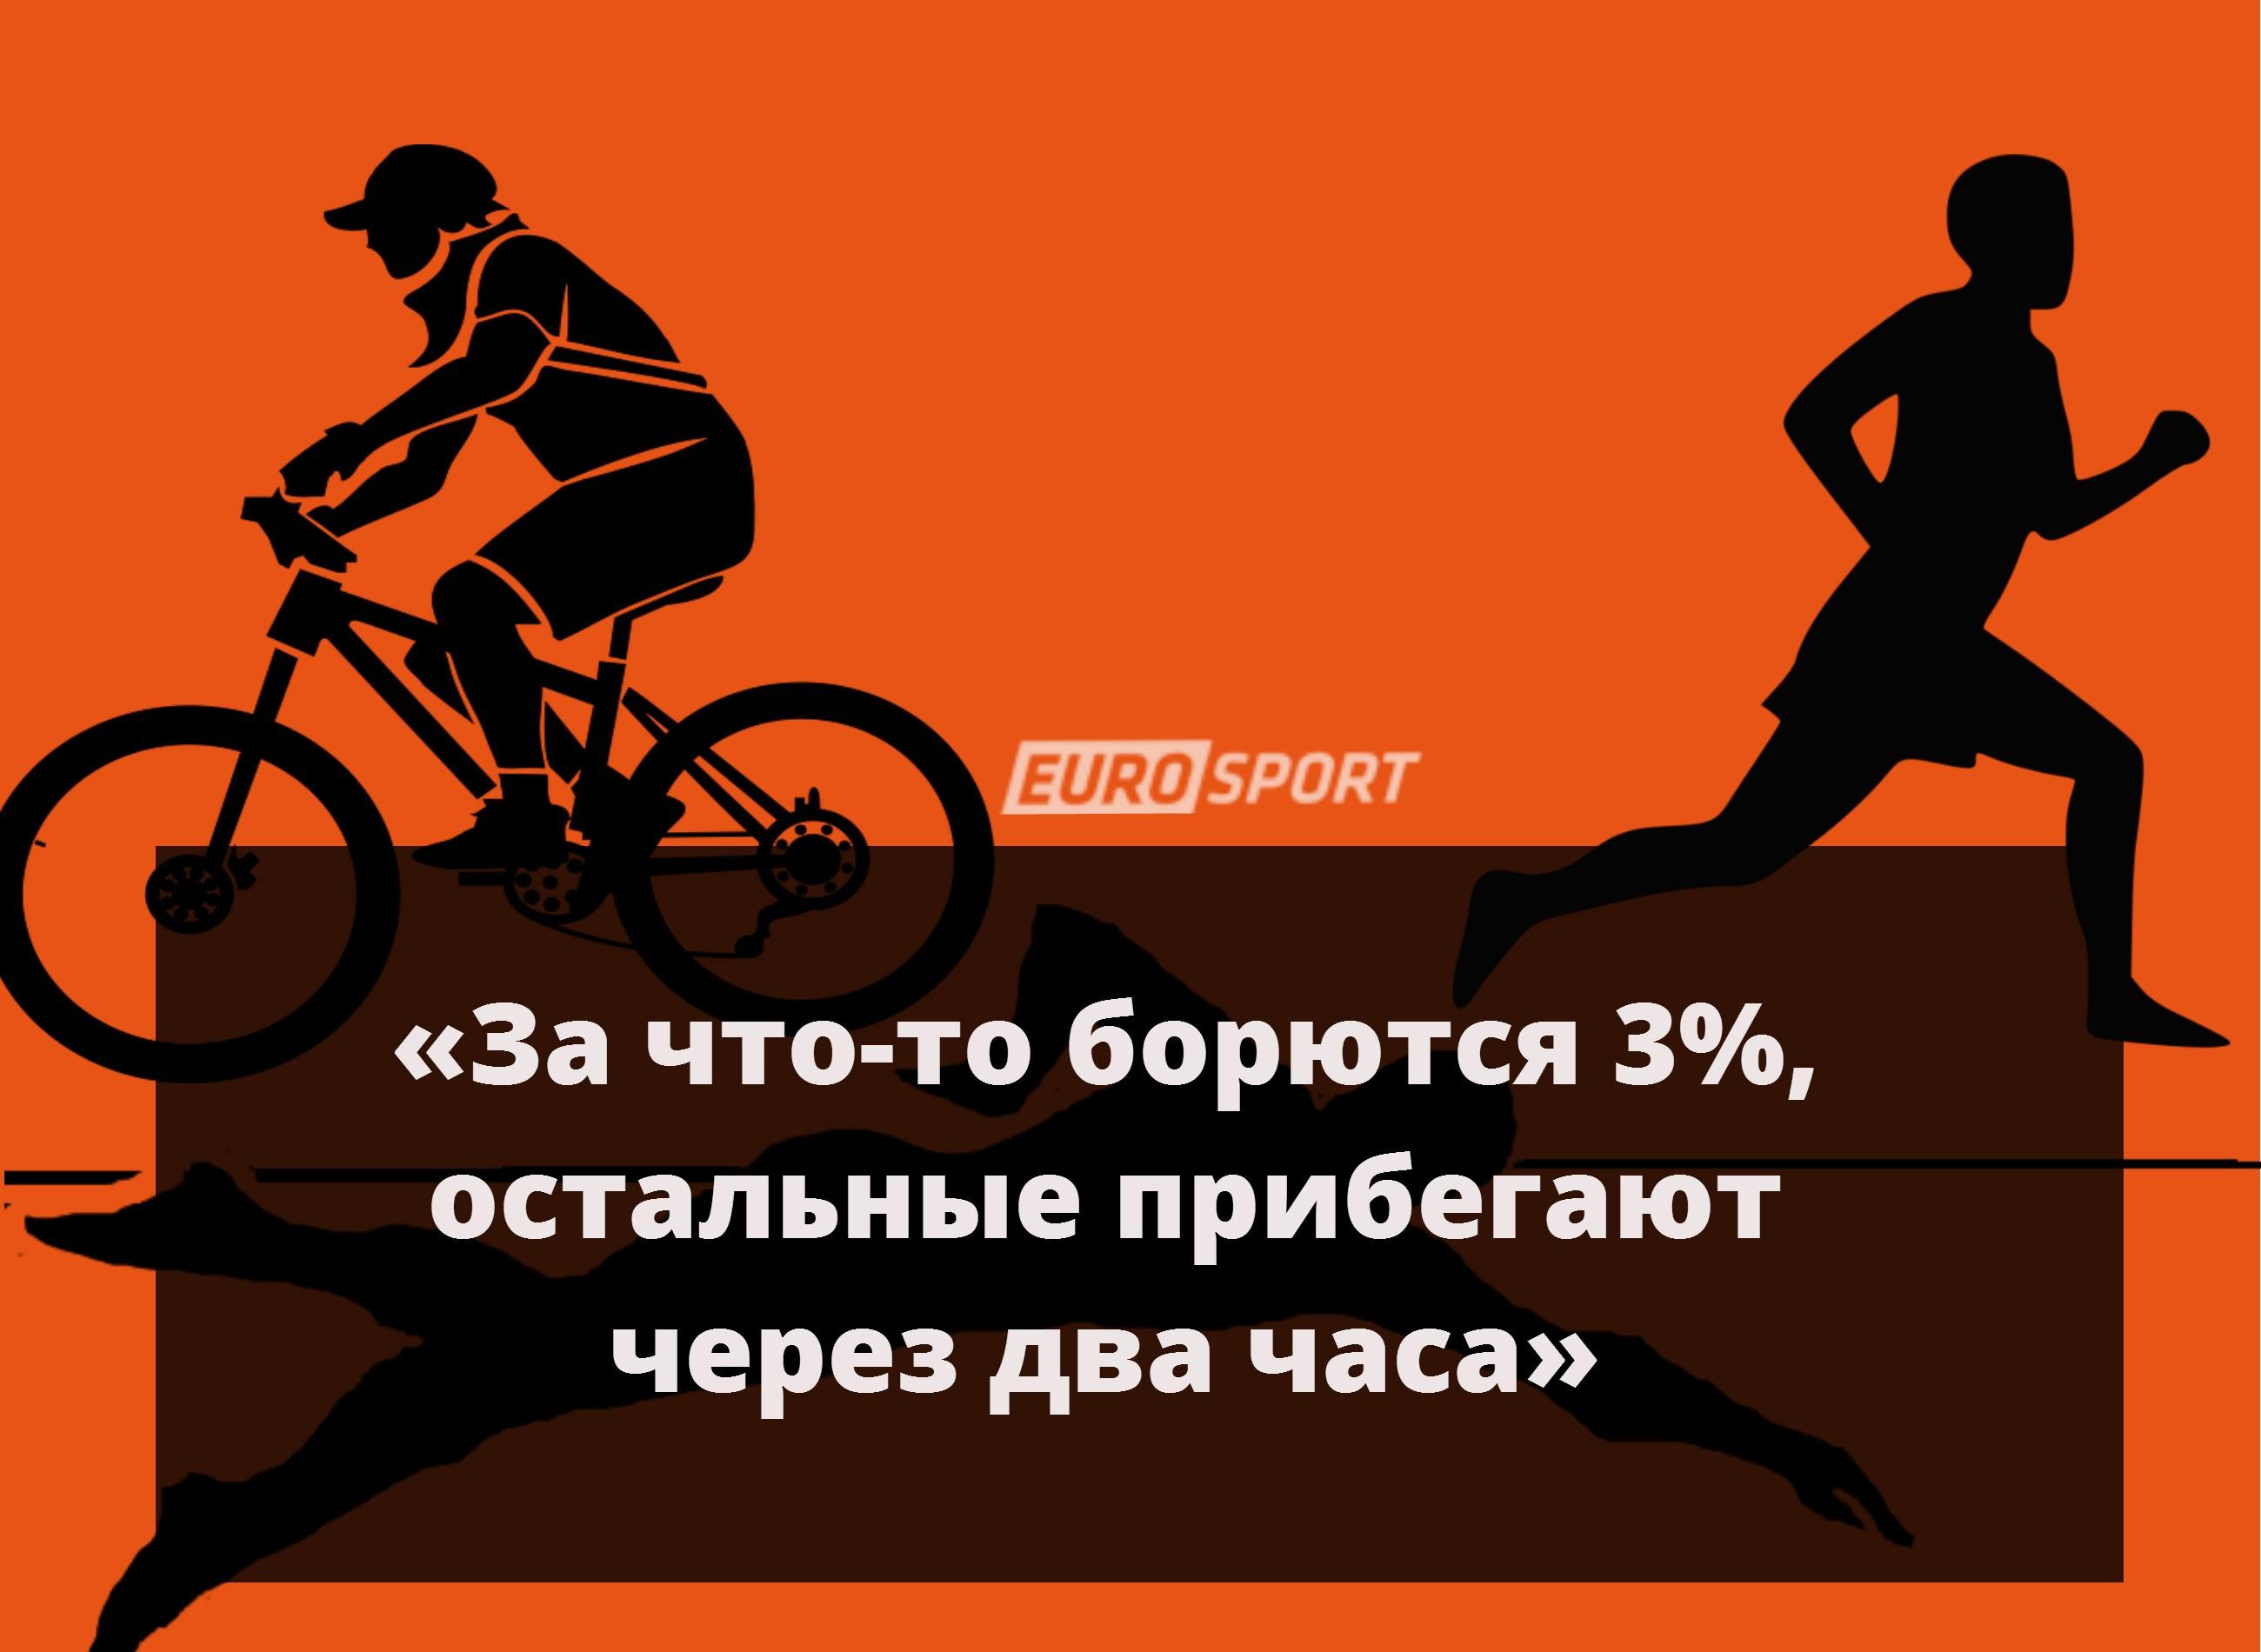 https://i.eurosport.com/2015/05/22/1567544.jpg